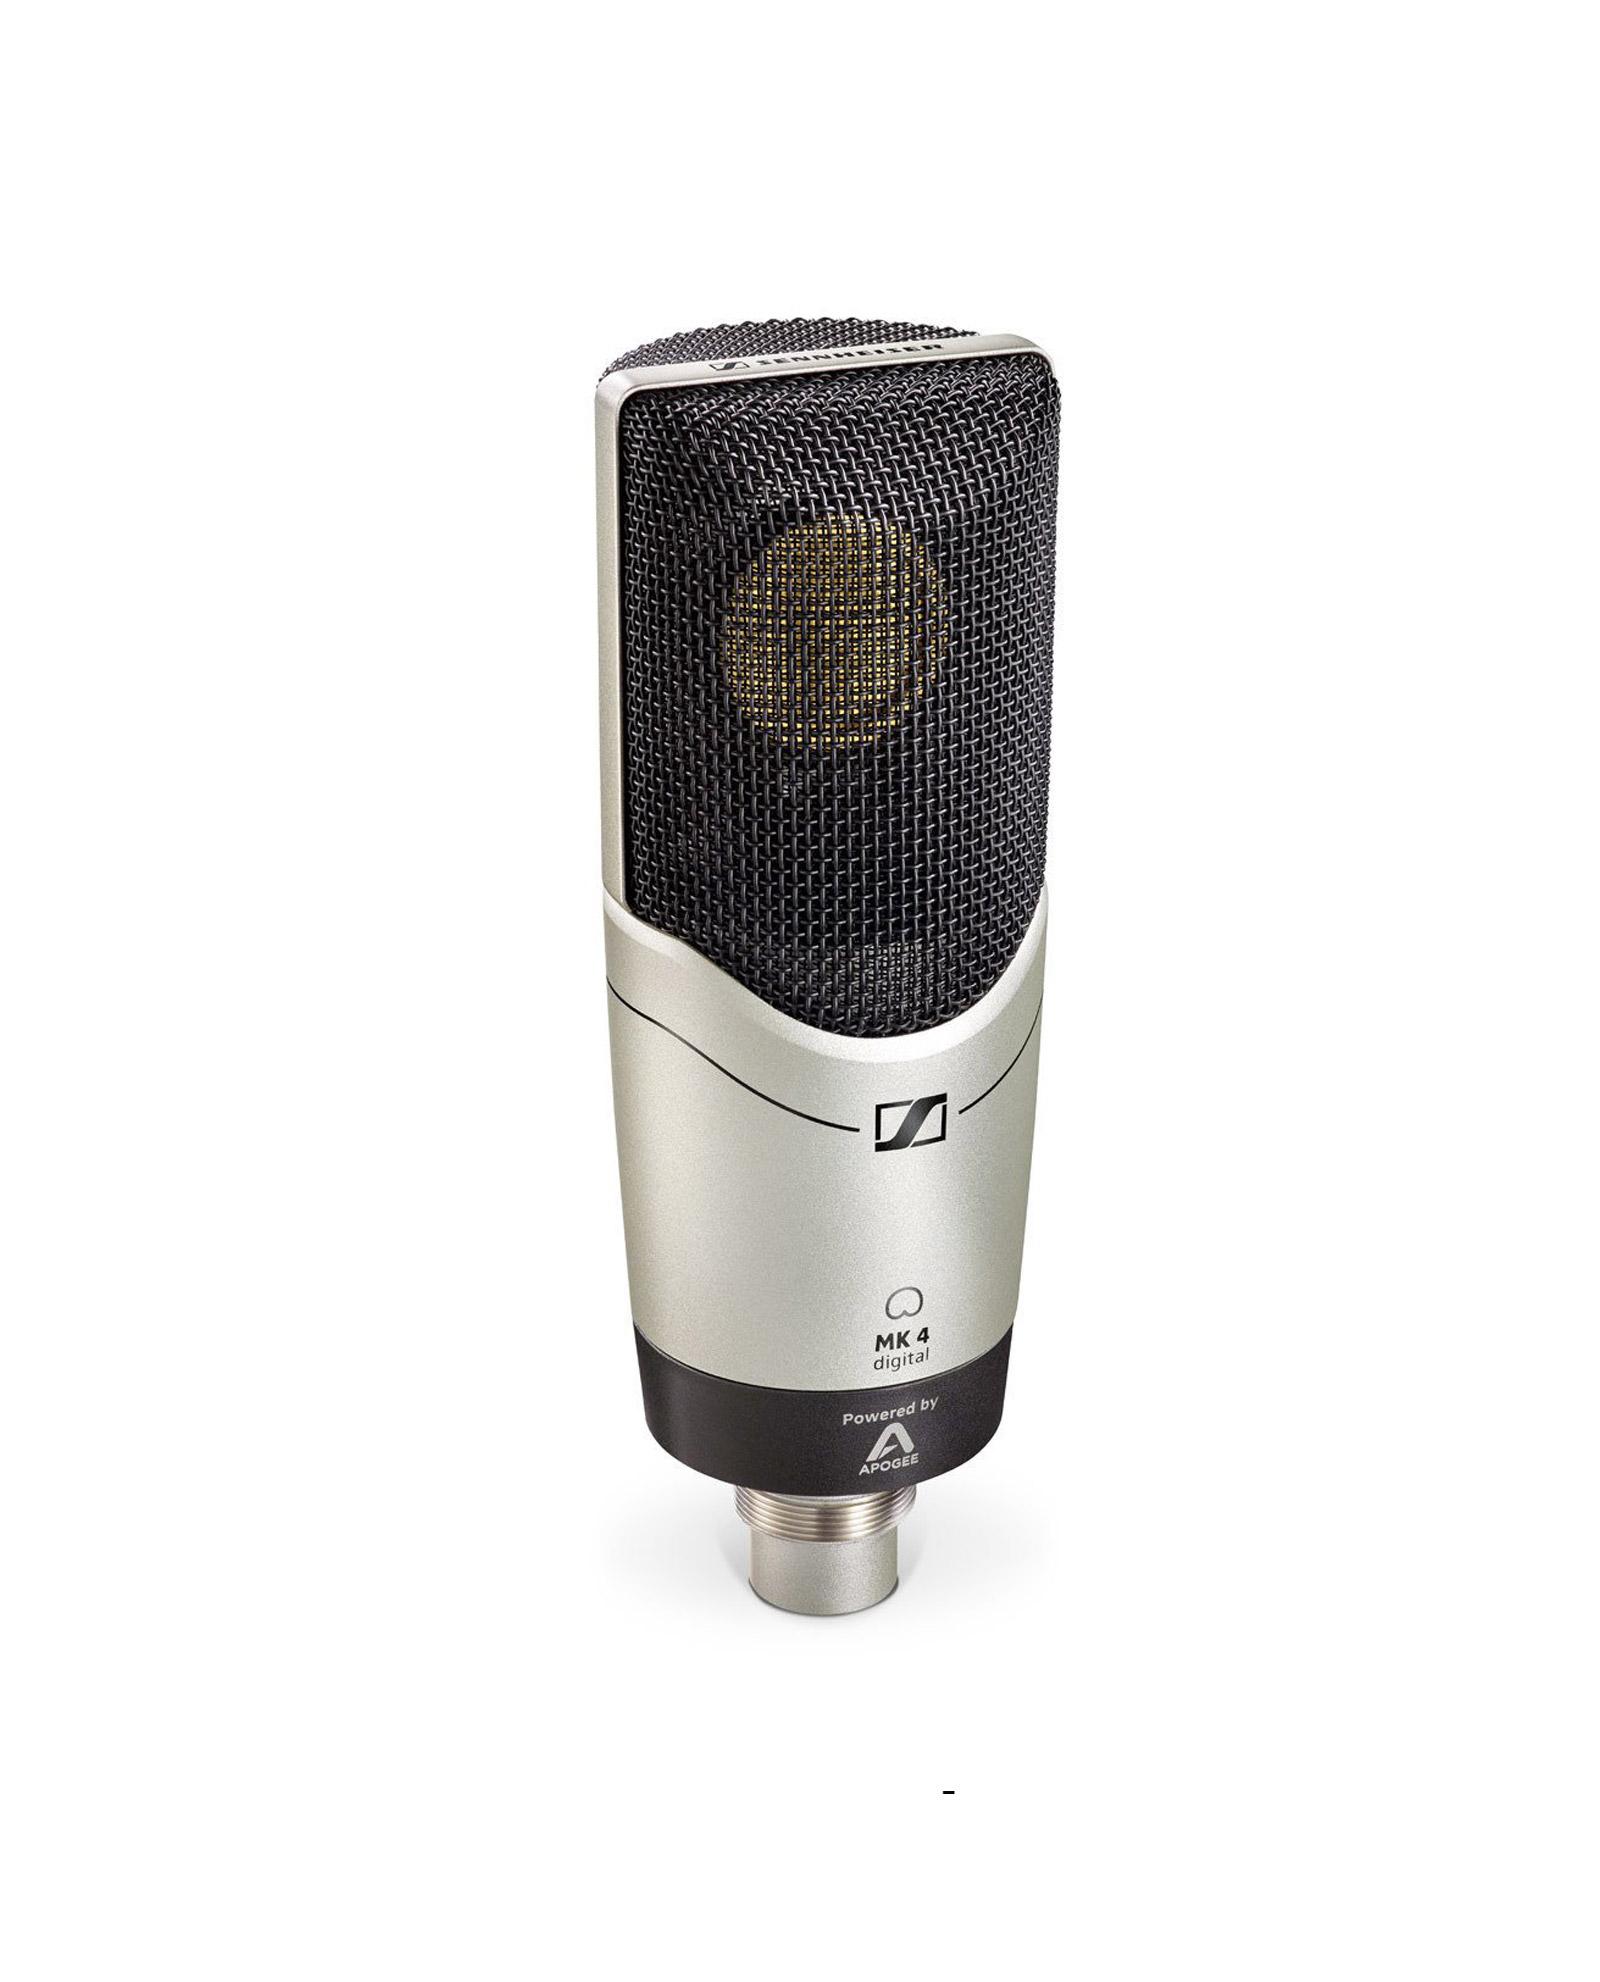 Sennheiser Mk 4 Condenser Microphone For Professional Studio Recordings